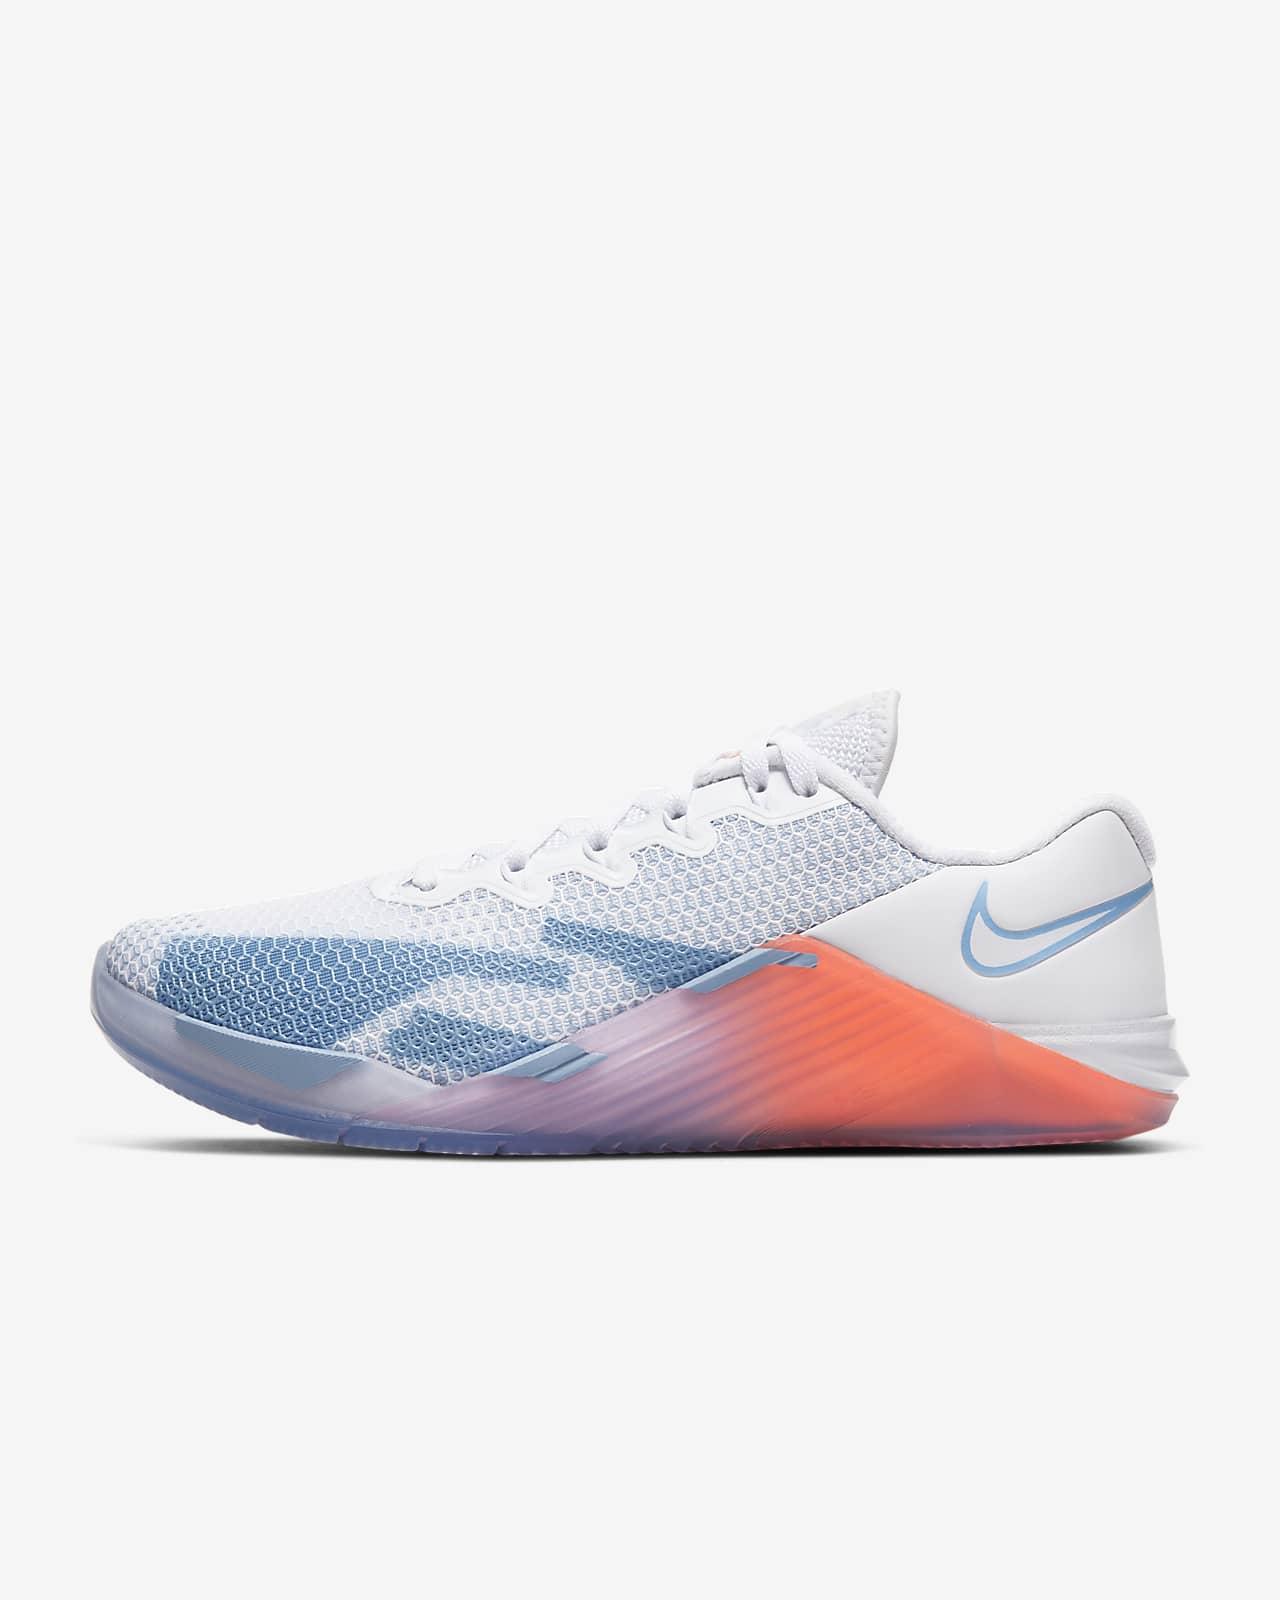 Nike Metcon 5 Premium Women's Training Shoe